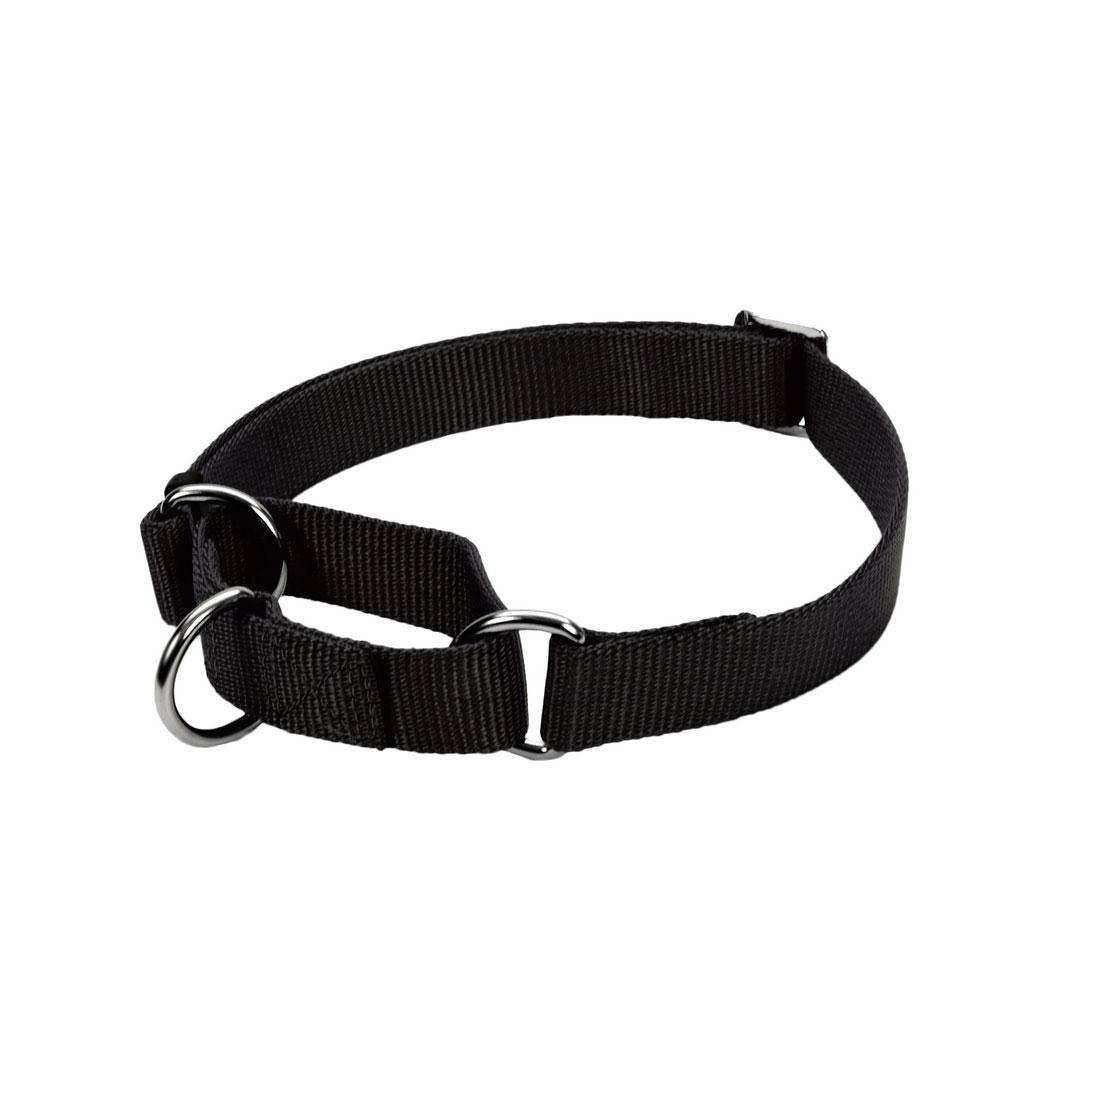 No! Slip Martingale Adjustable Dog Collar, Black, 5/8-in x 10-14-in